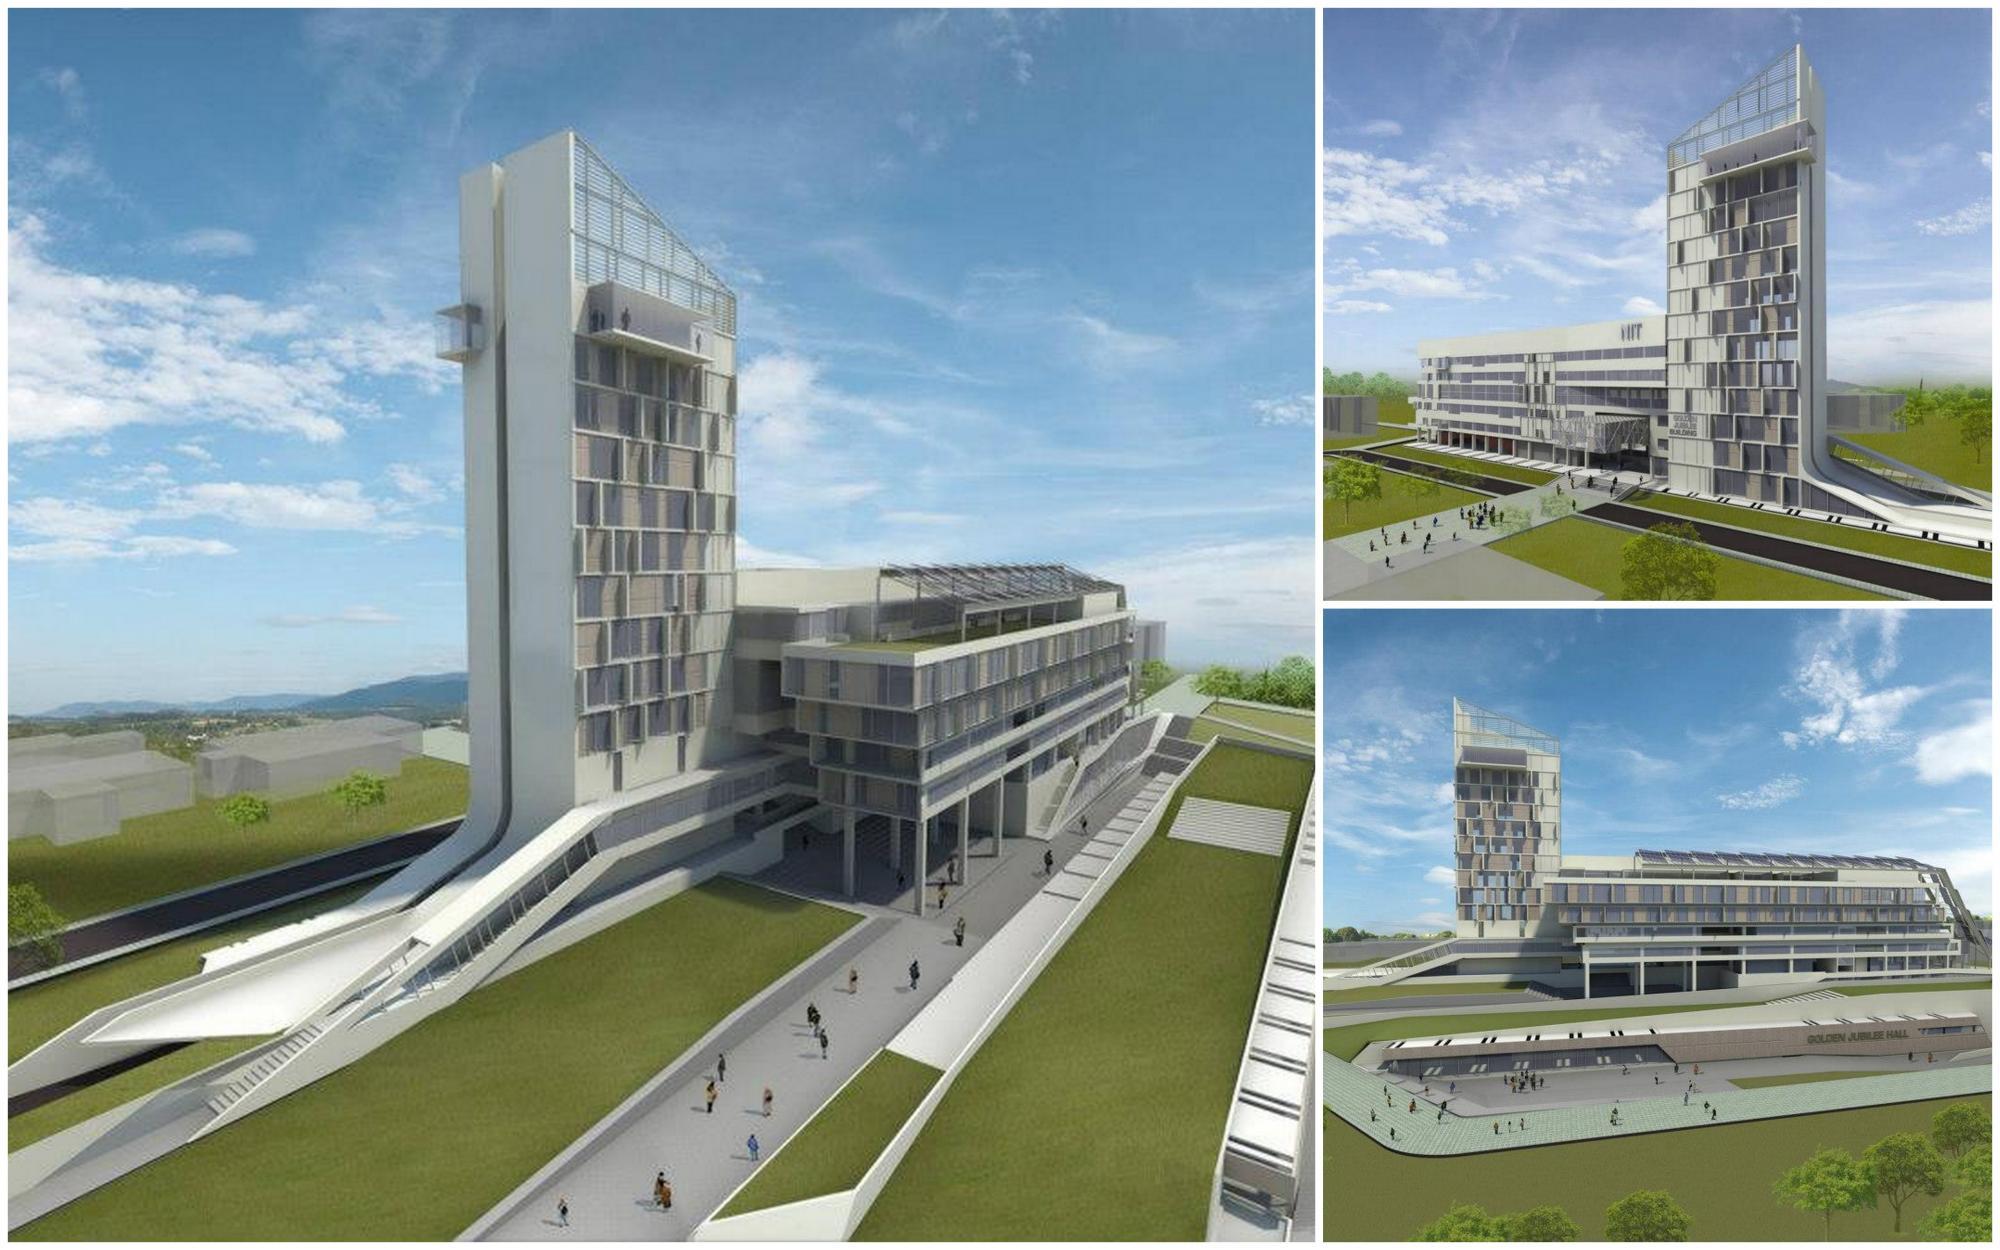 NIT Rourkela proposed infrastructure